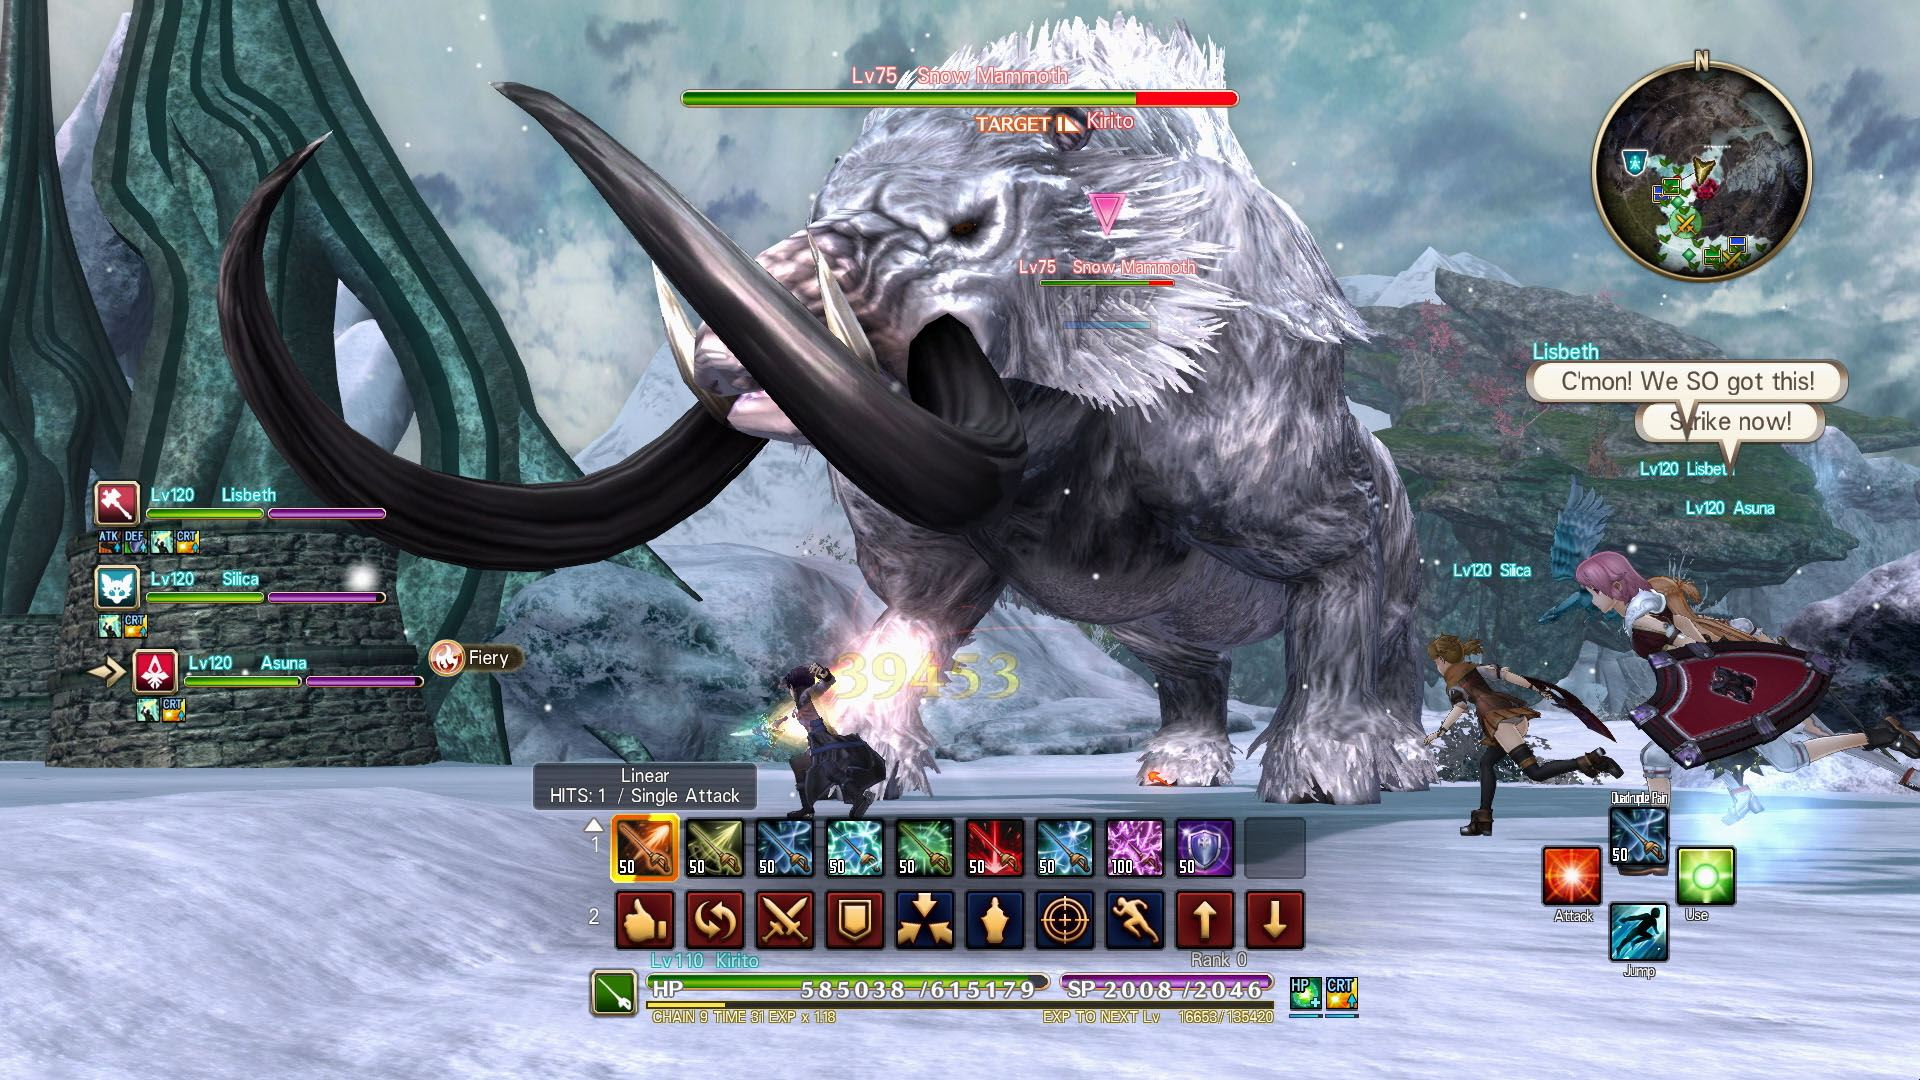 Sword Art Online: Hollow Realization - Sword Art Online: Fatal Bullet